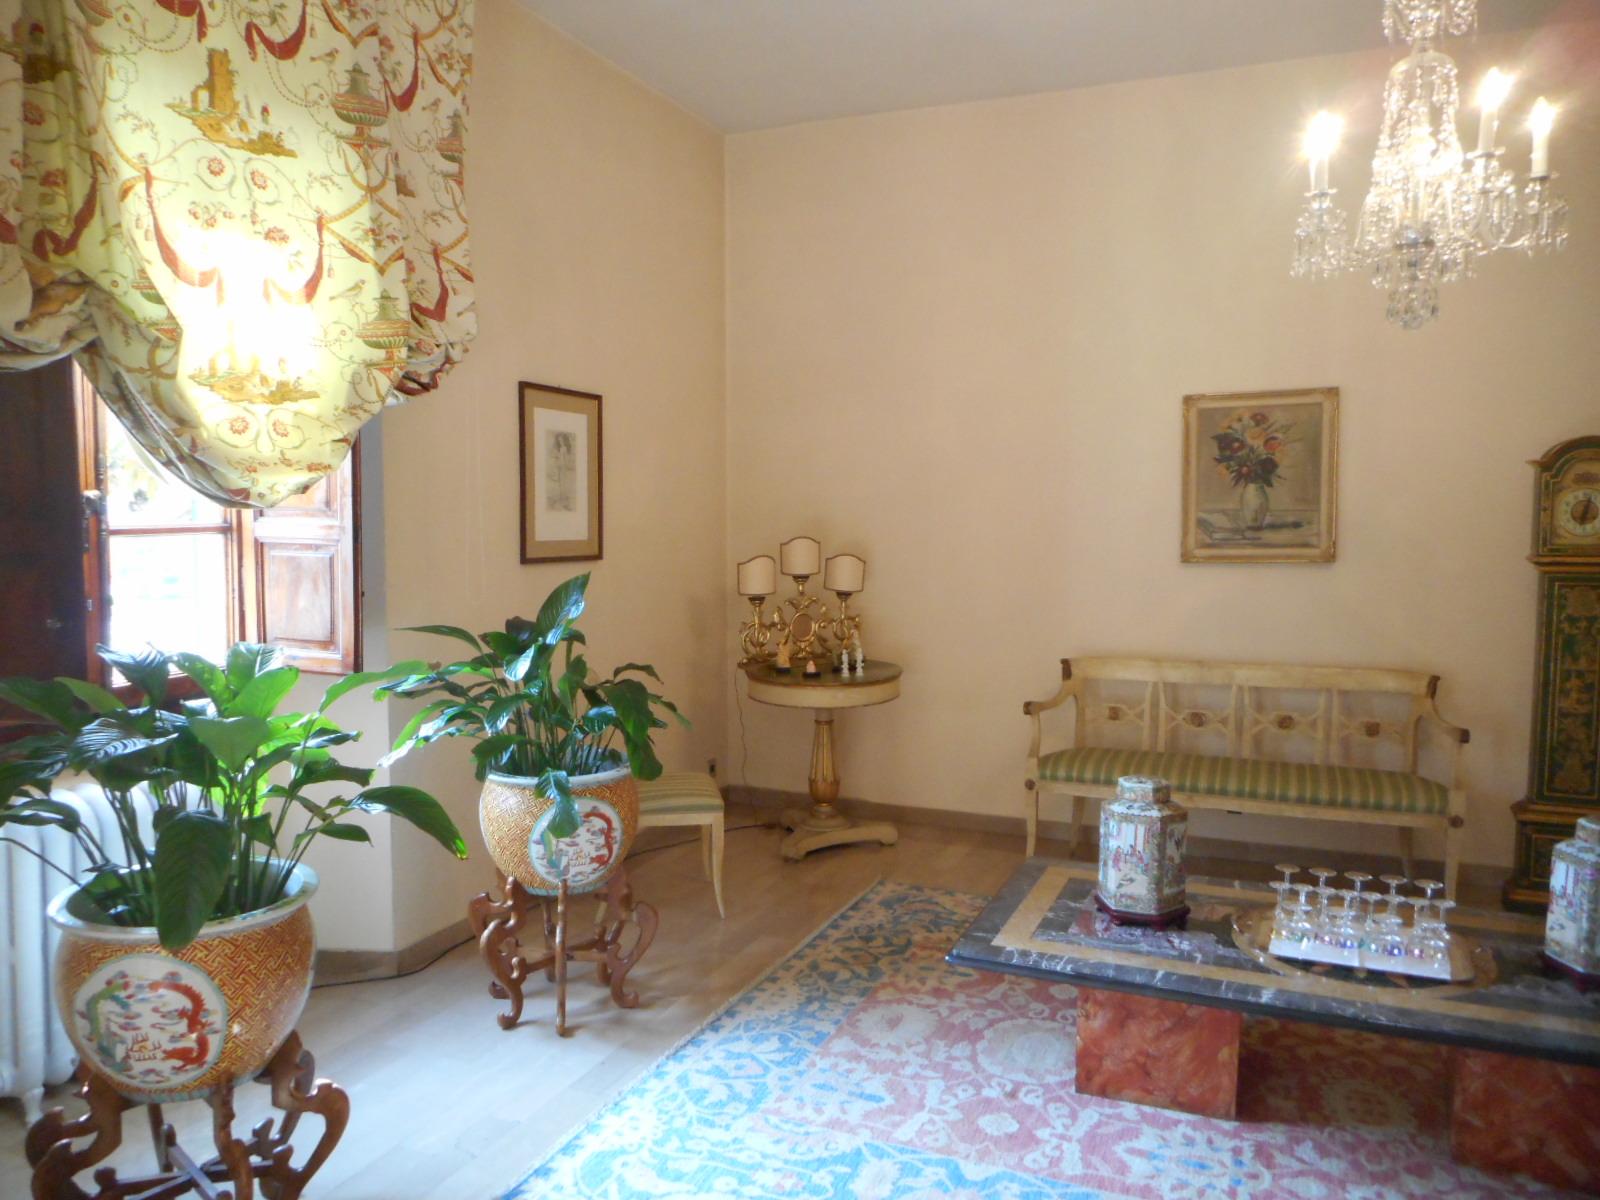 VIA DALMAZIA,PISTOIA,51100,4 Bedrooms Bedrooms,3 BathroomsBathrooms,Villa,VIA DALMAZIA,1438